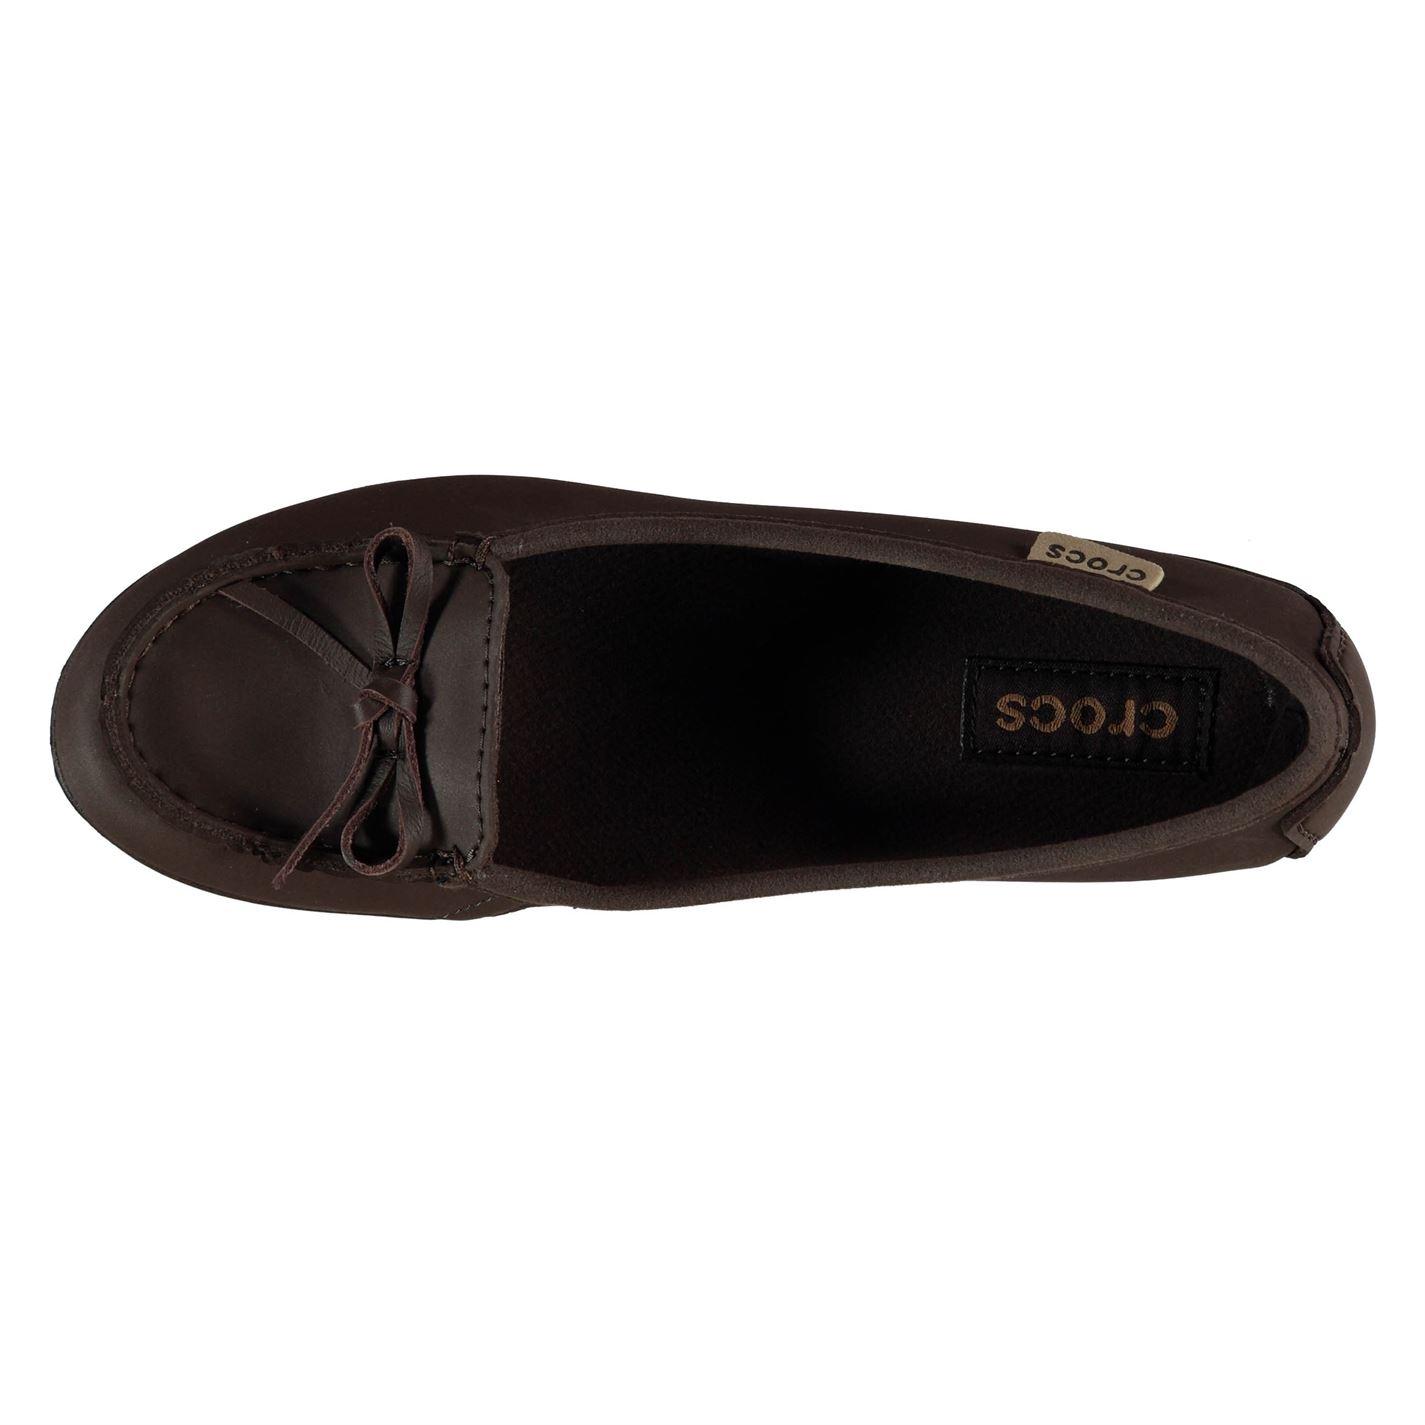 167e8bf67 Crocs Womens Wrap Colorite Ballet Flats Ladies Shoes Slip On Casual ...